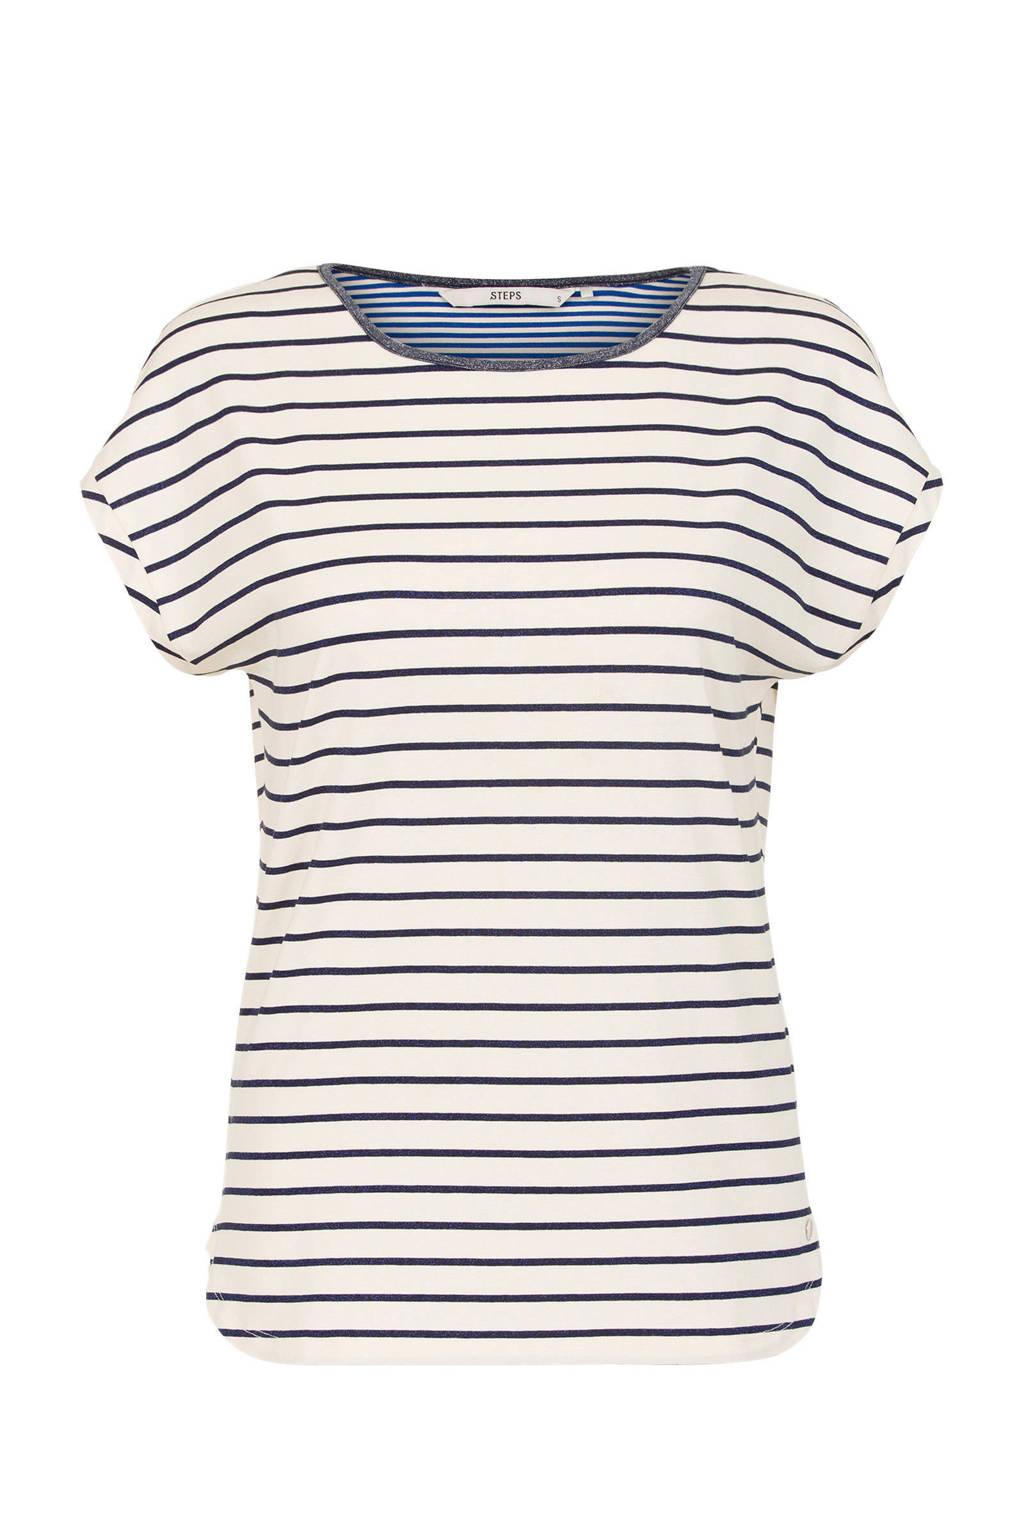 Steps gestreept T-shirt wit, Wit